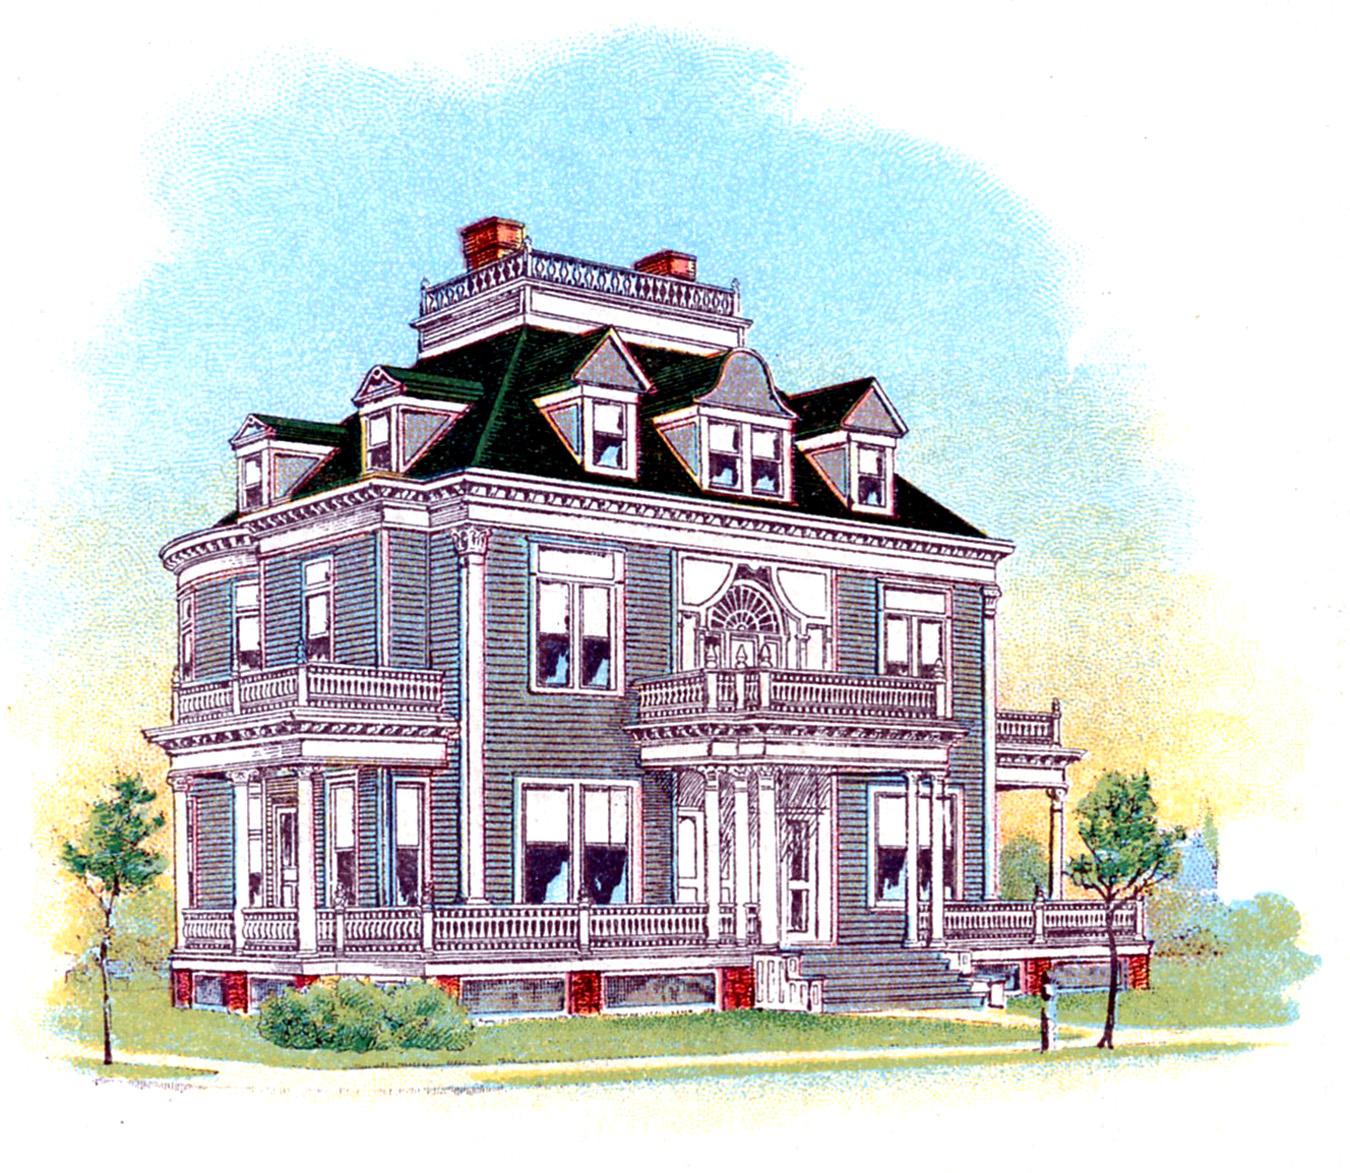 Vintage home clipart jpg stock Vintage home clipart - Clip Art Library jpg stock